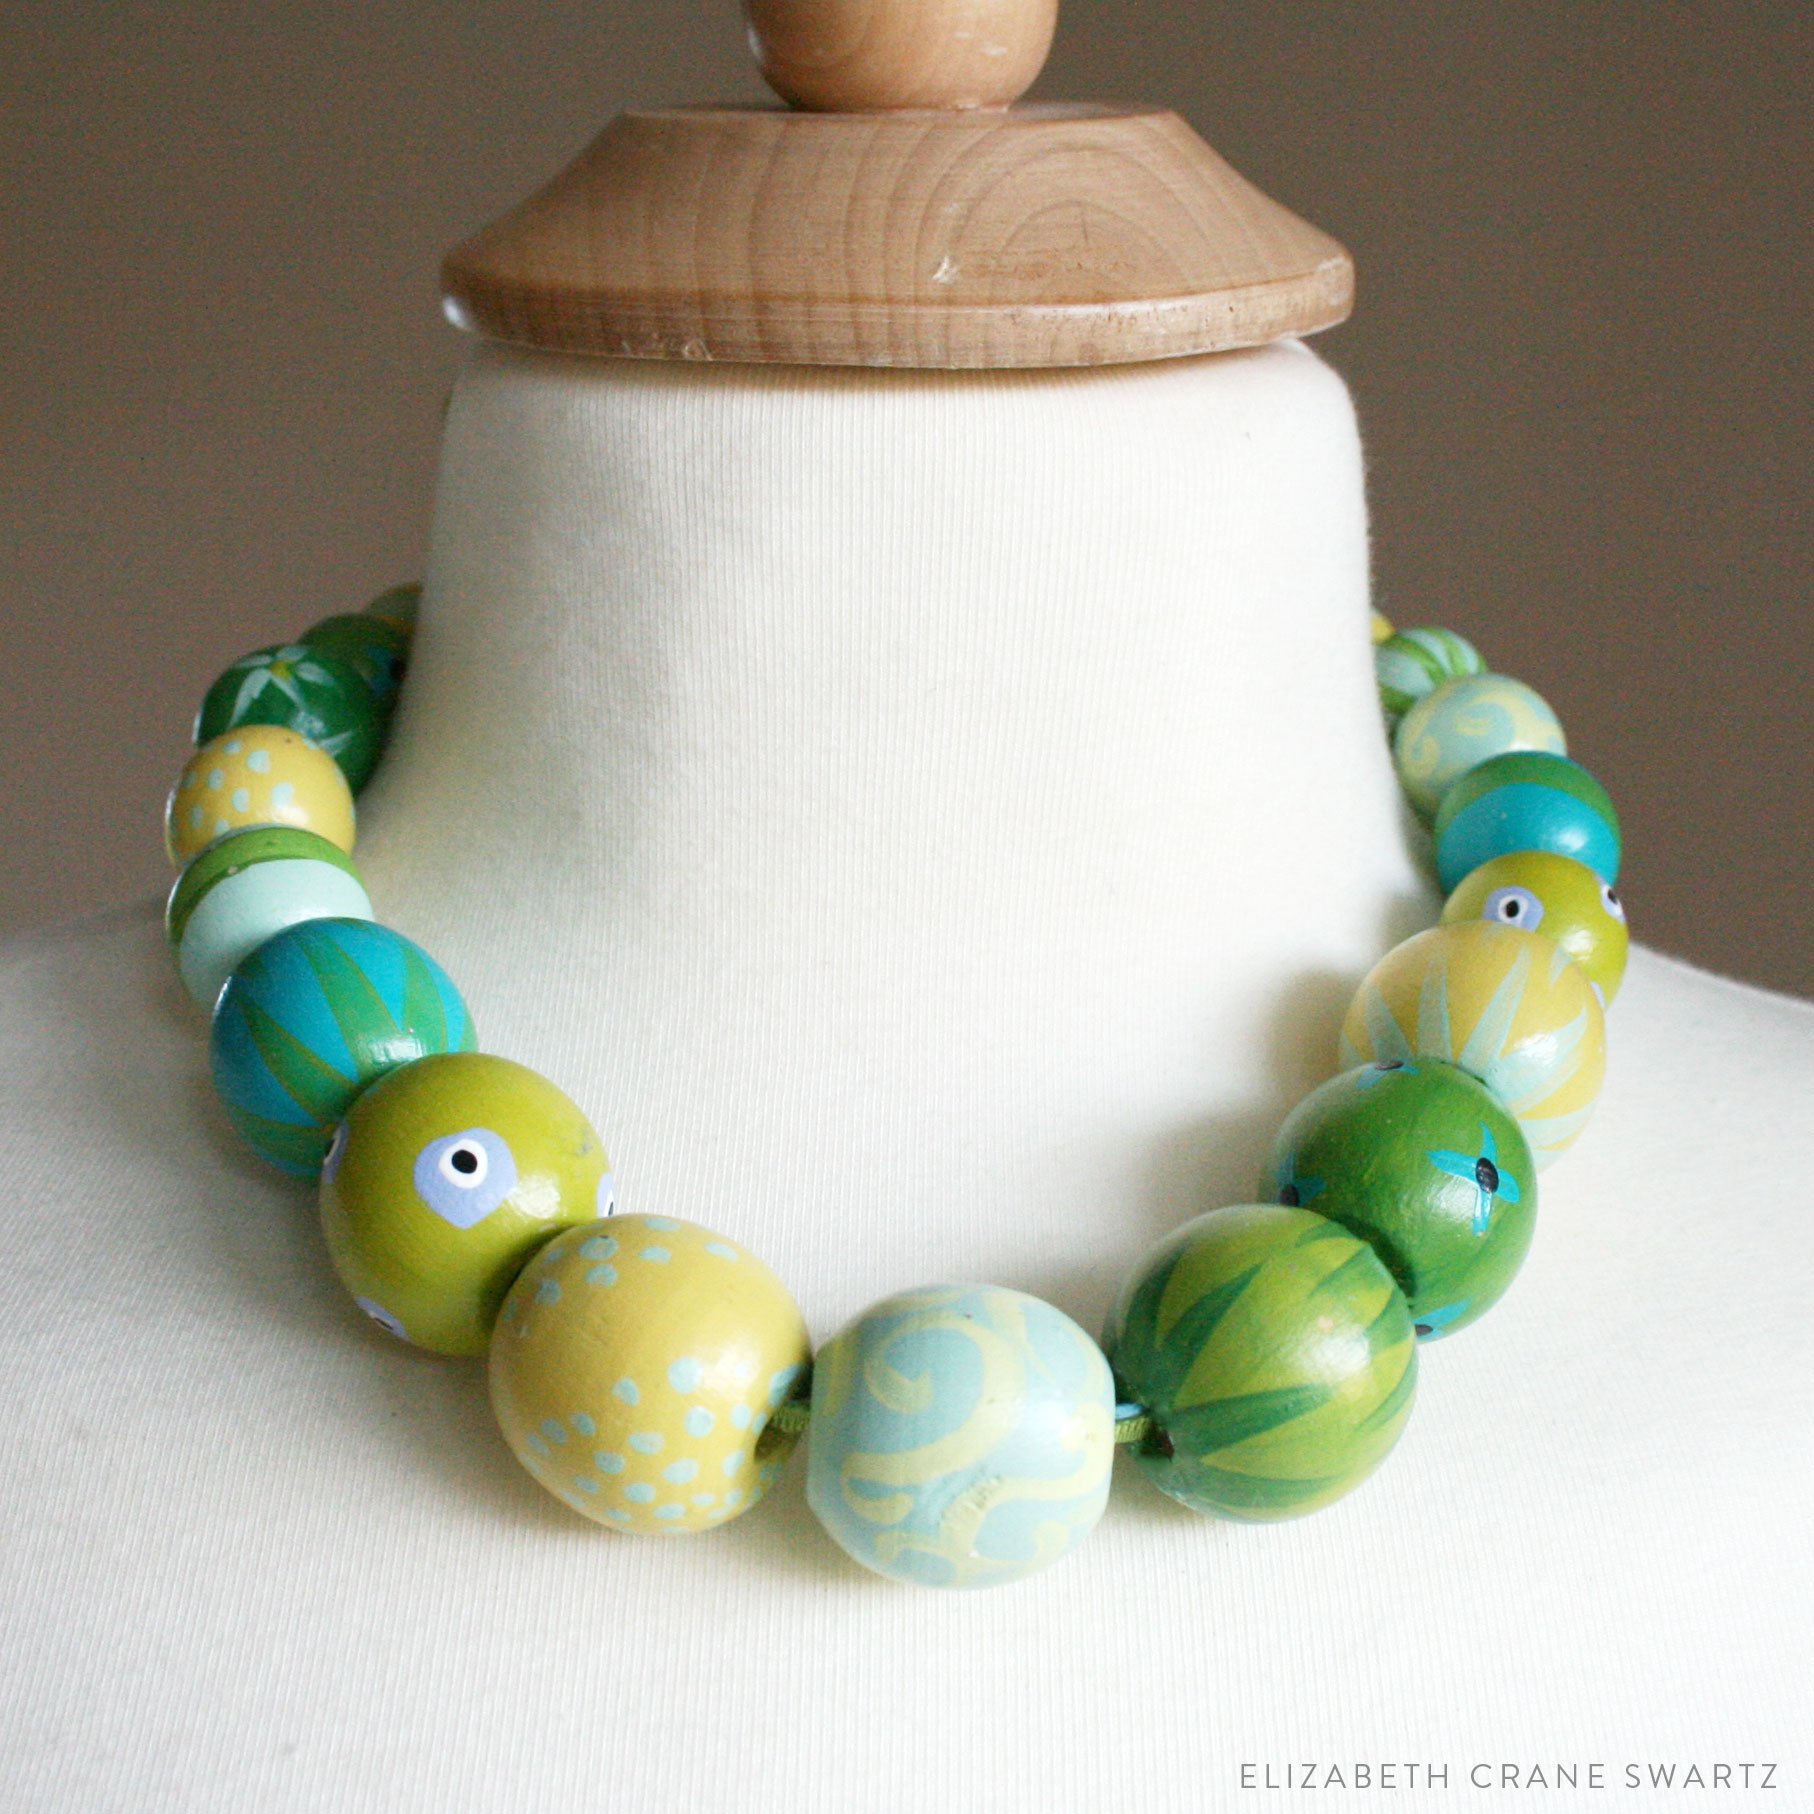 libby-necklace / elizabethcraneswartz.com